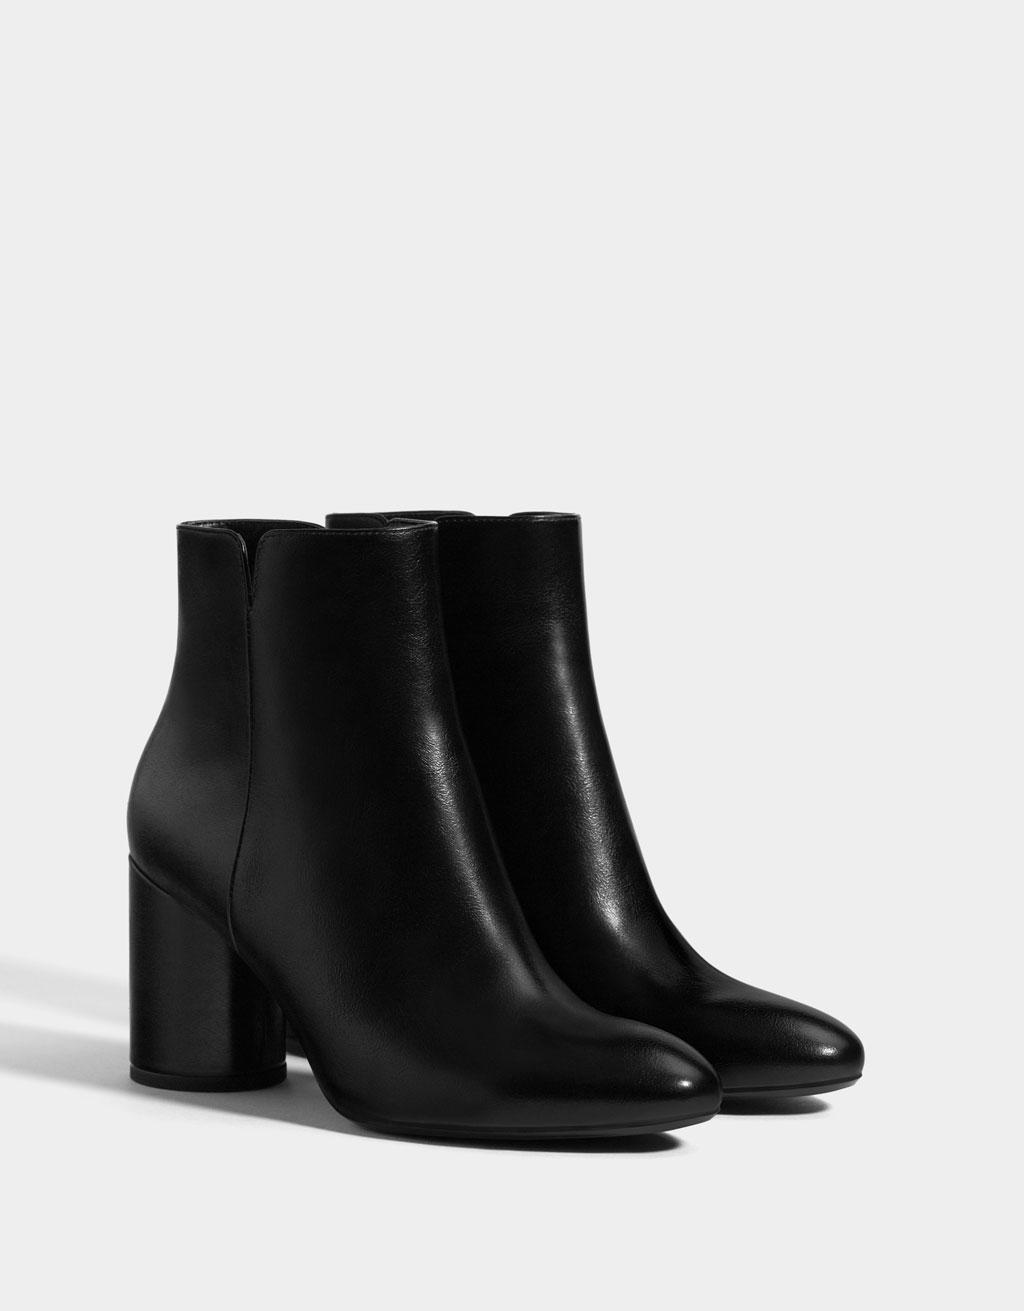 669d00392938 Zip-up high-heel ankle boots - Shoes - Bershka Philippines